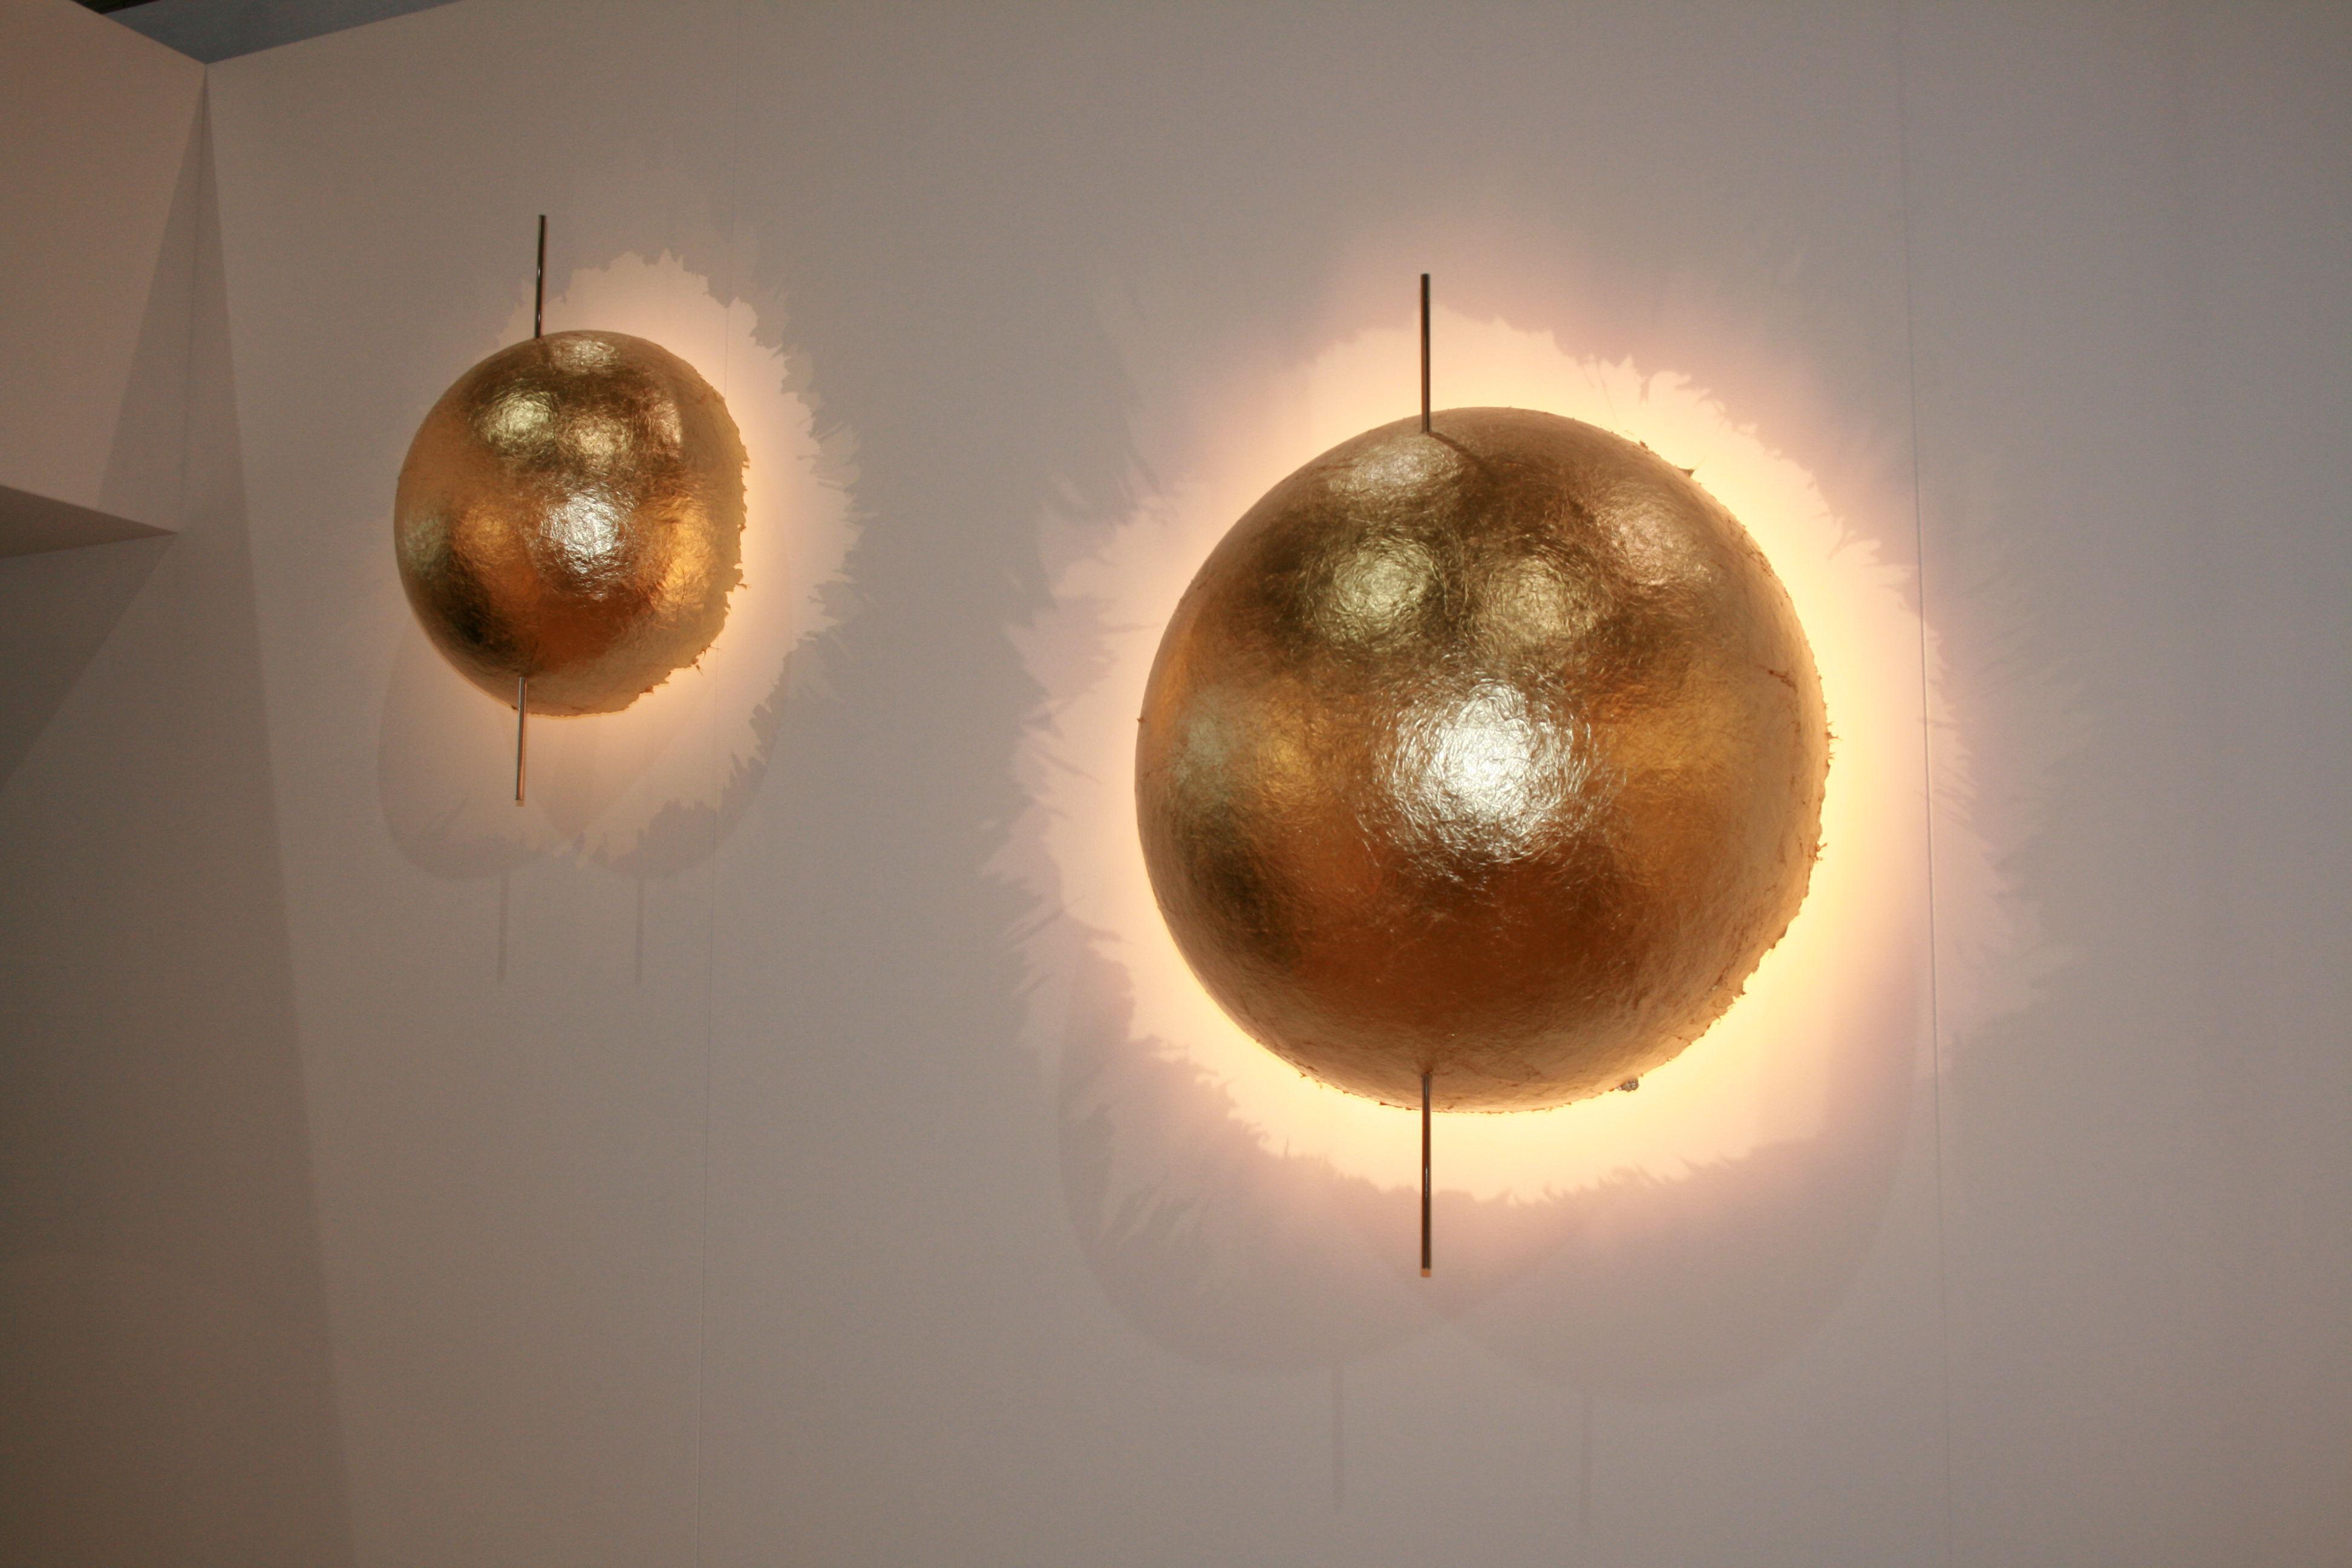 Tula applique xal illuminazione roma tulli luce